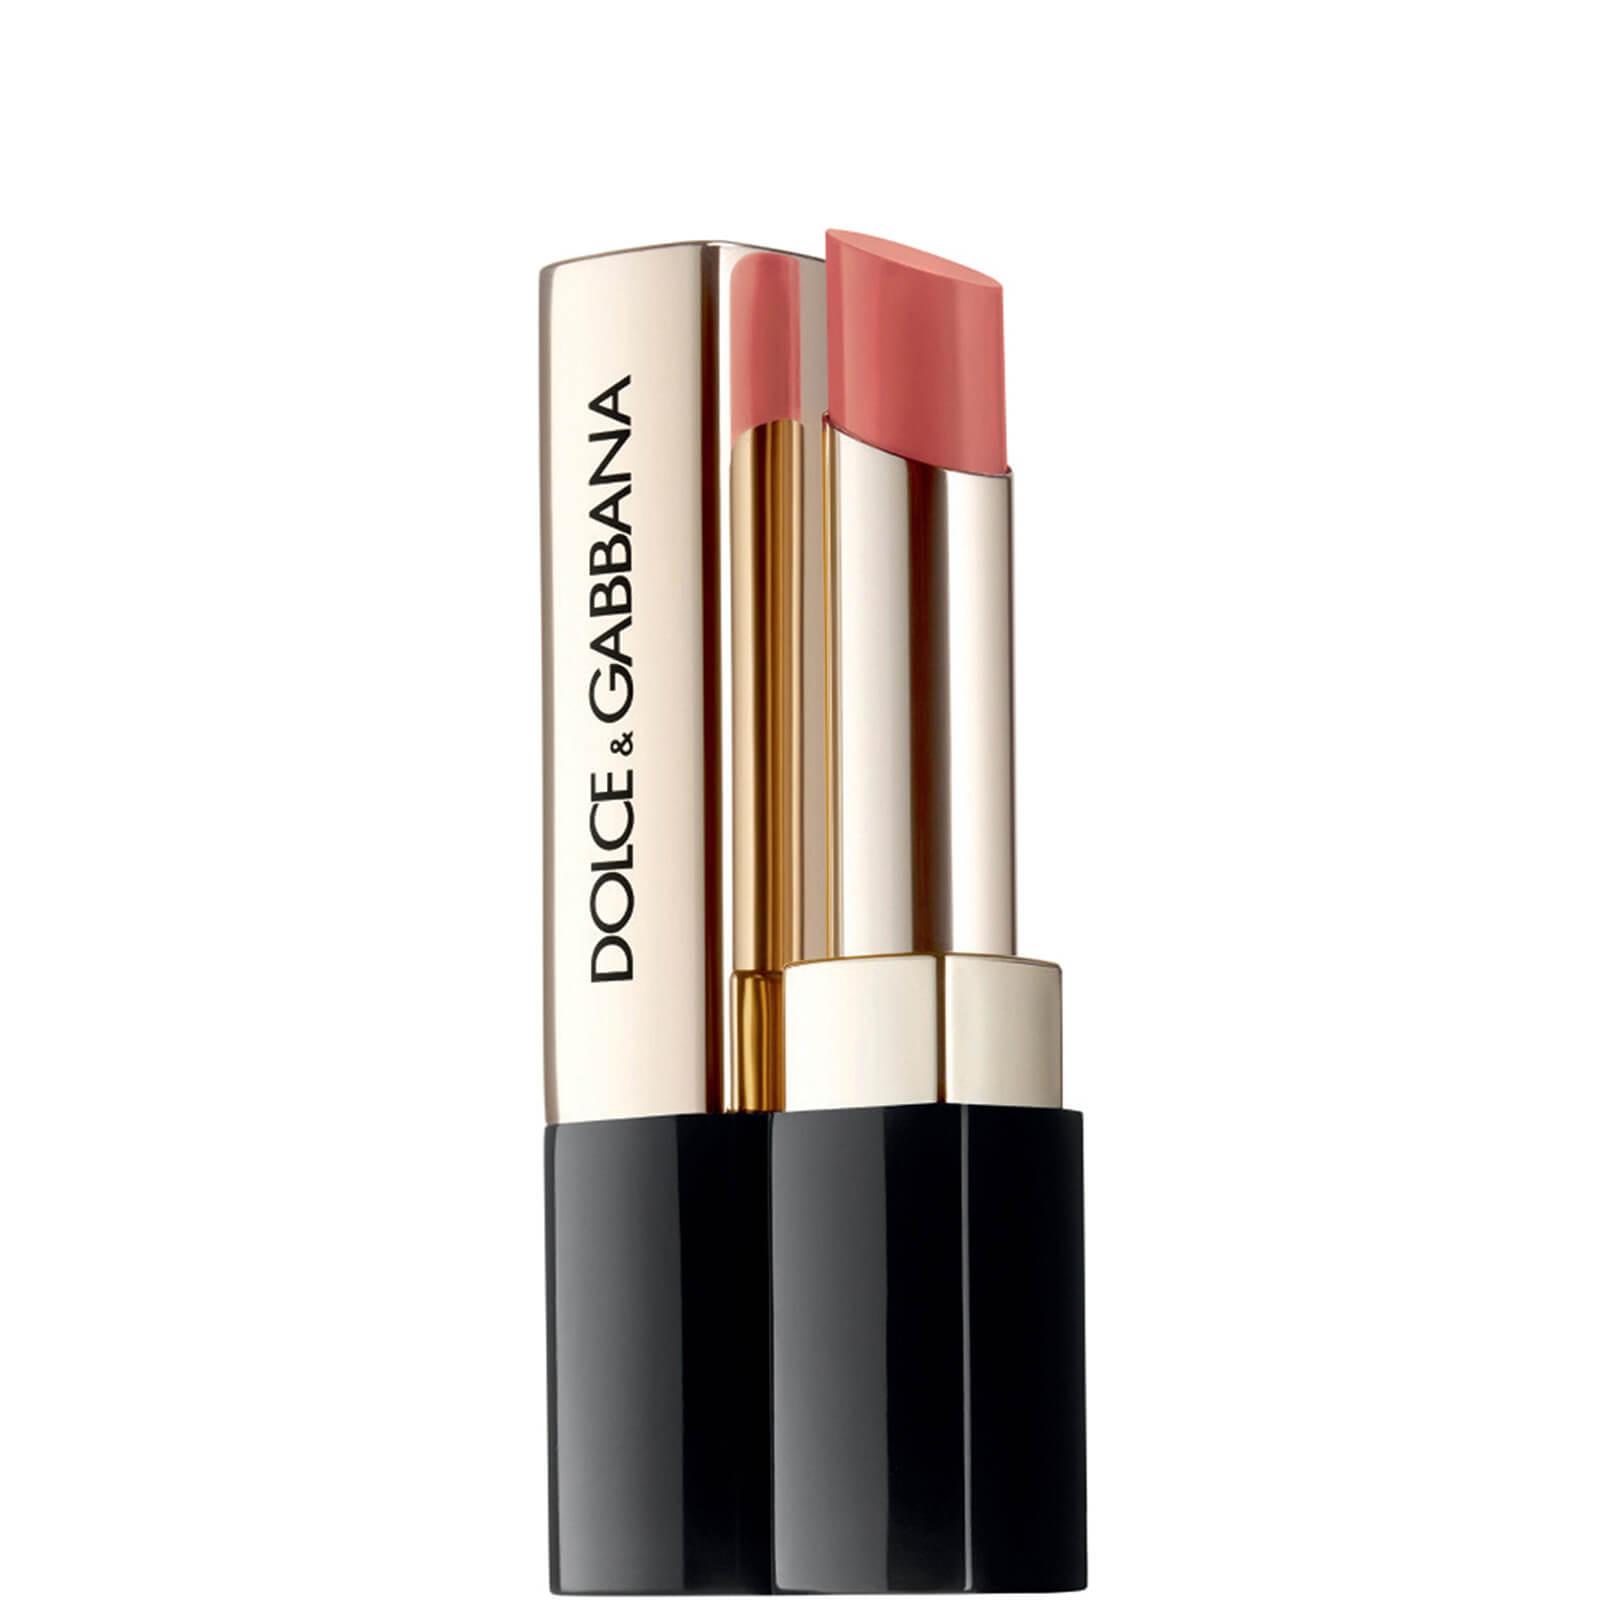 Купить Dolce&Gabbana Miss Sicily Lipstick 2.5g (Various Shades) - 100 Anna